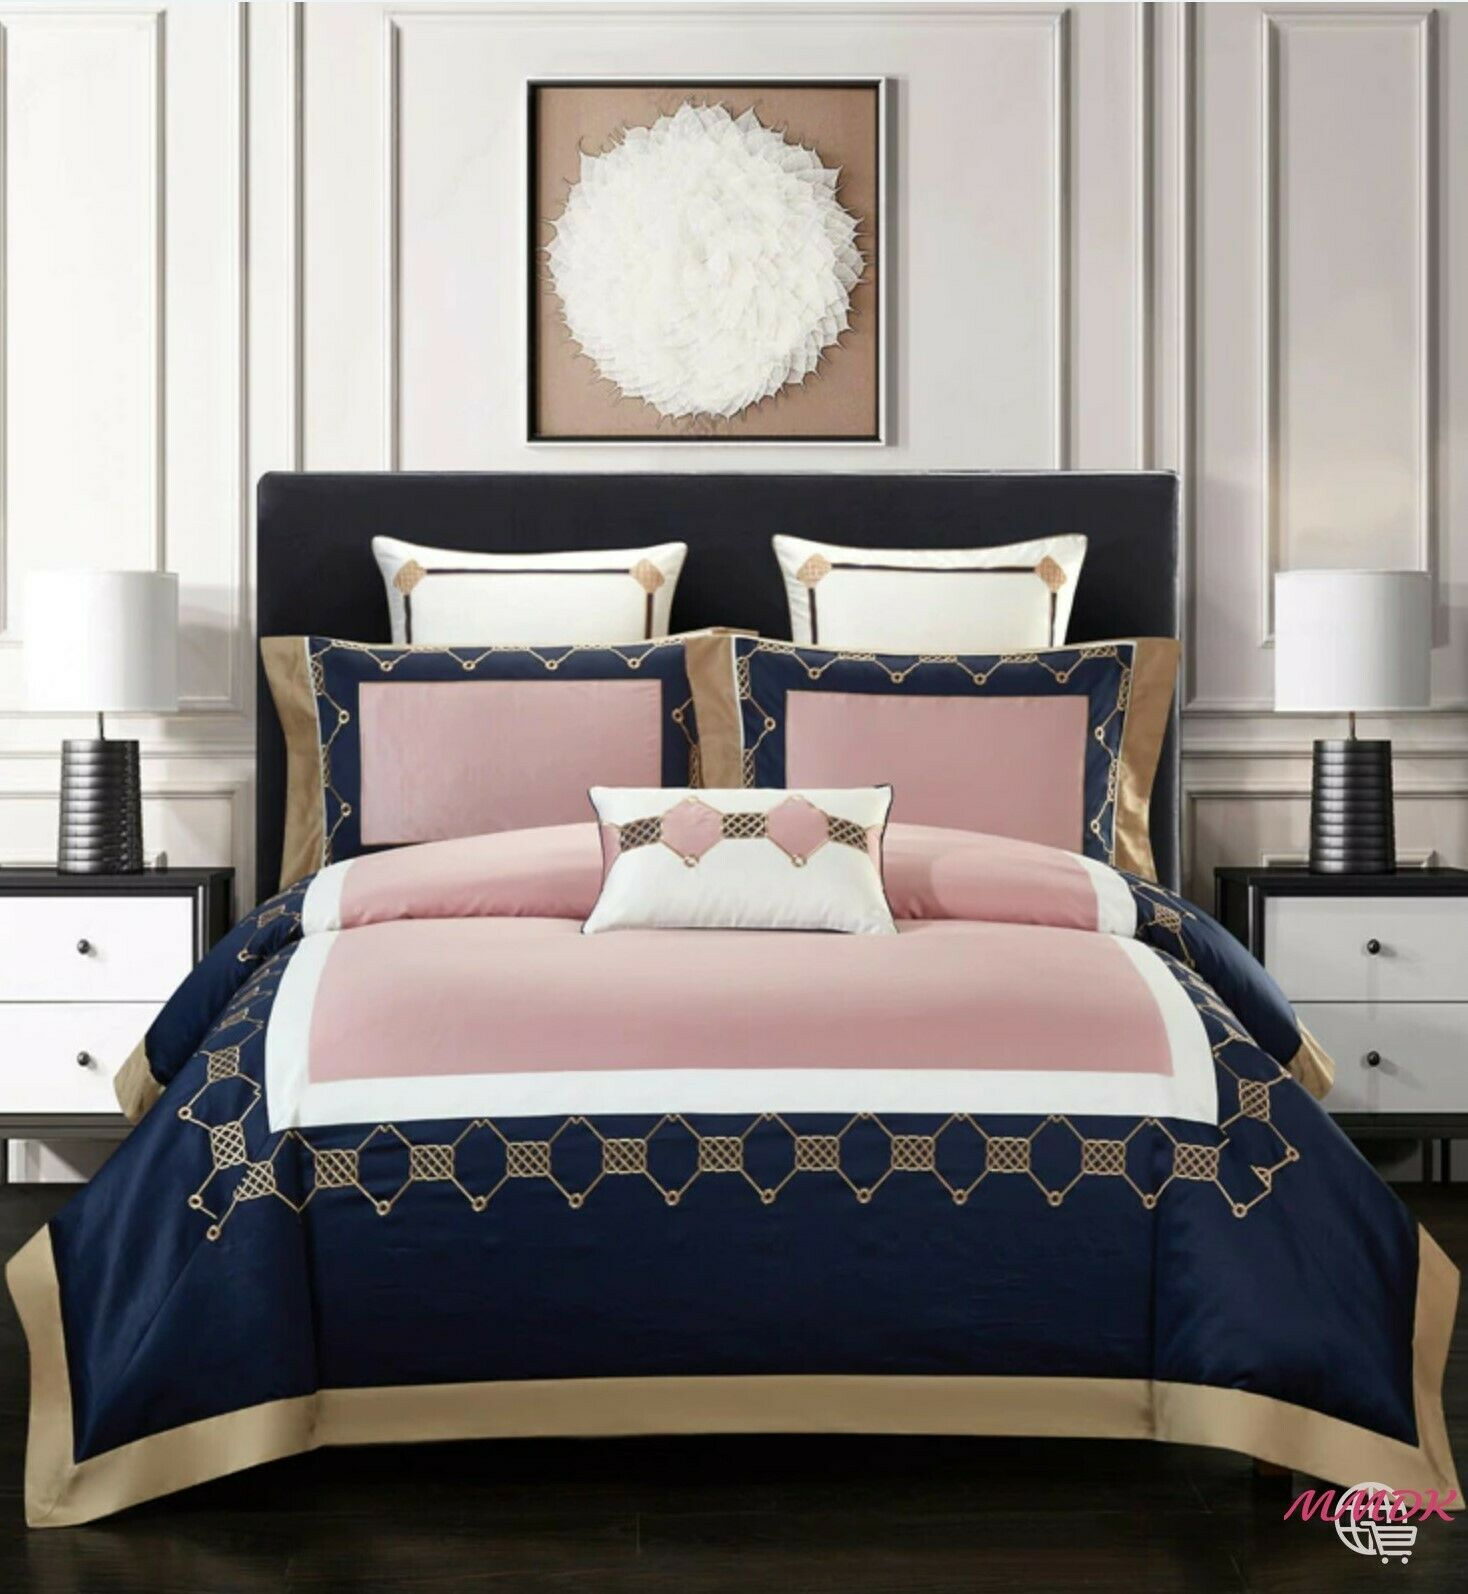 100%Egyptian Cotton Sanft Elegant Classic Embroiderot Duvet Startseite Bettding Set UPS